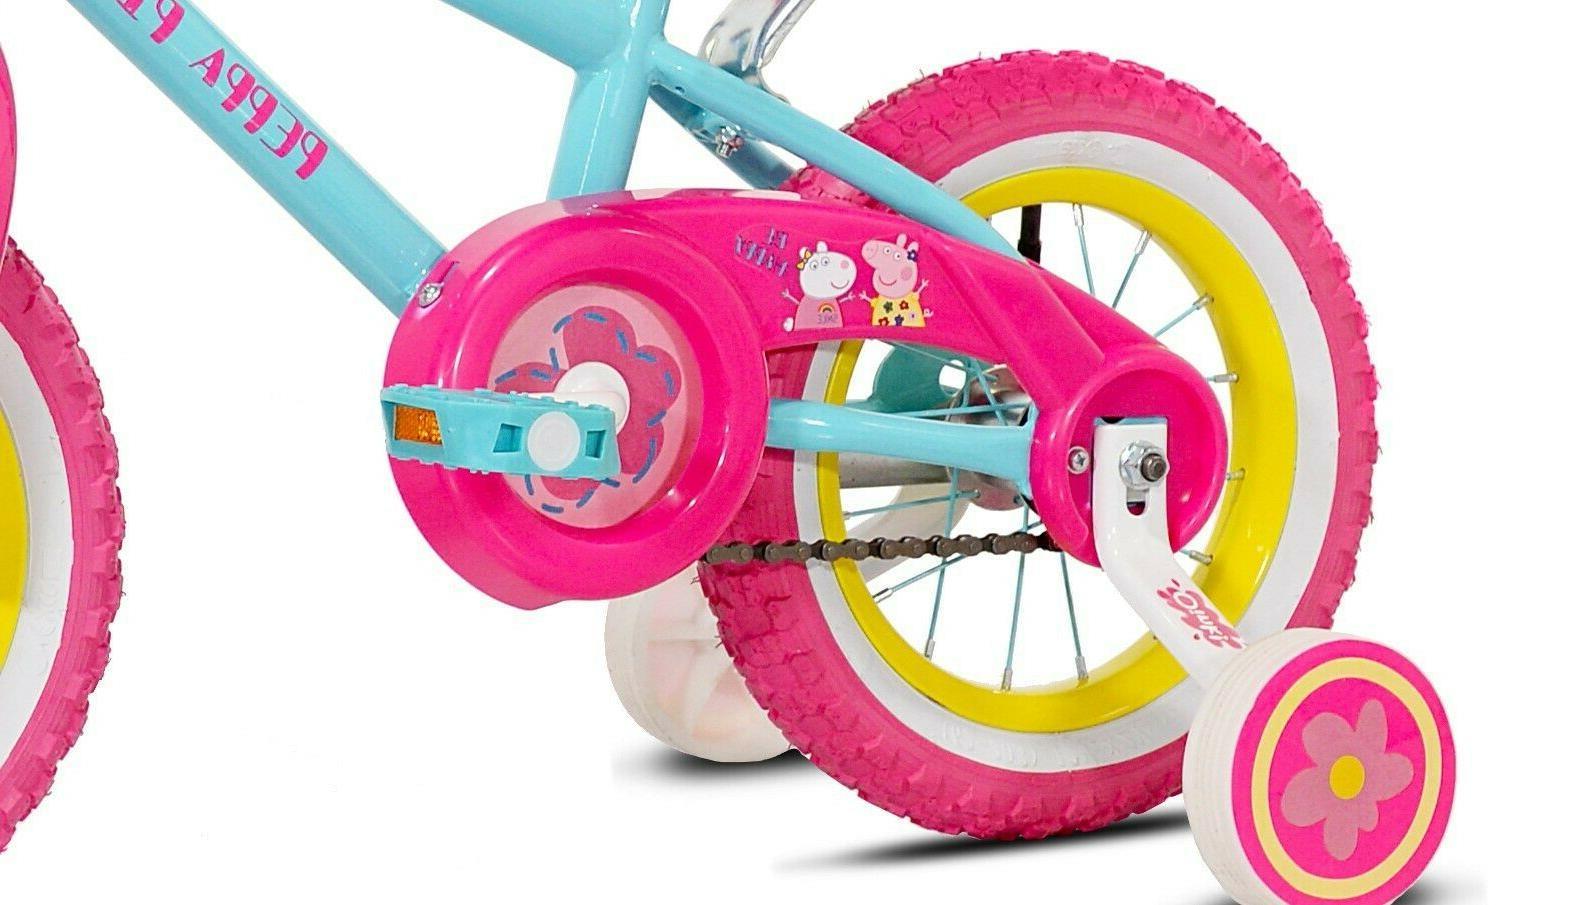 Peppa Pig Bike, Pink, For Height